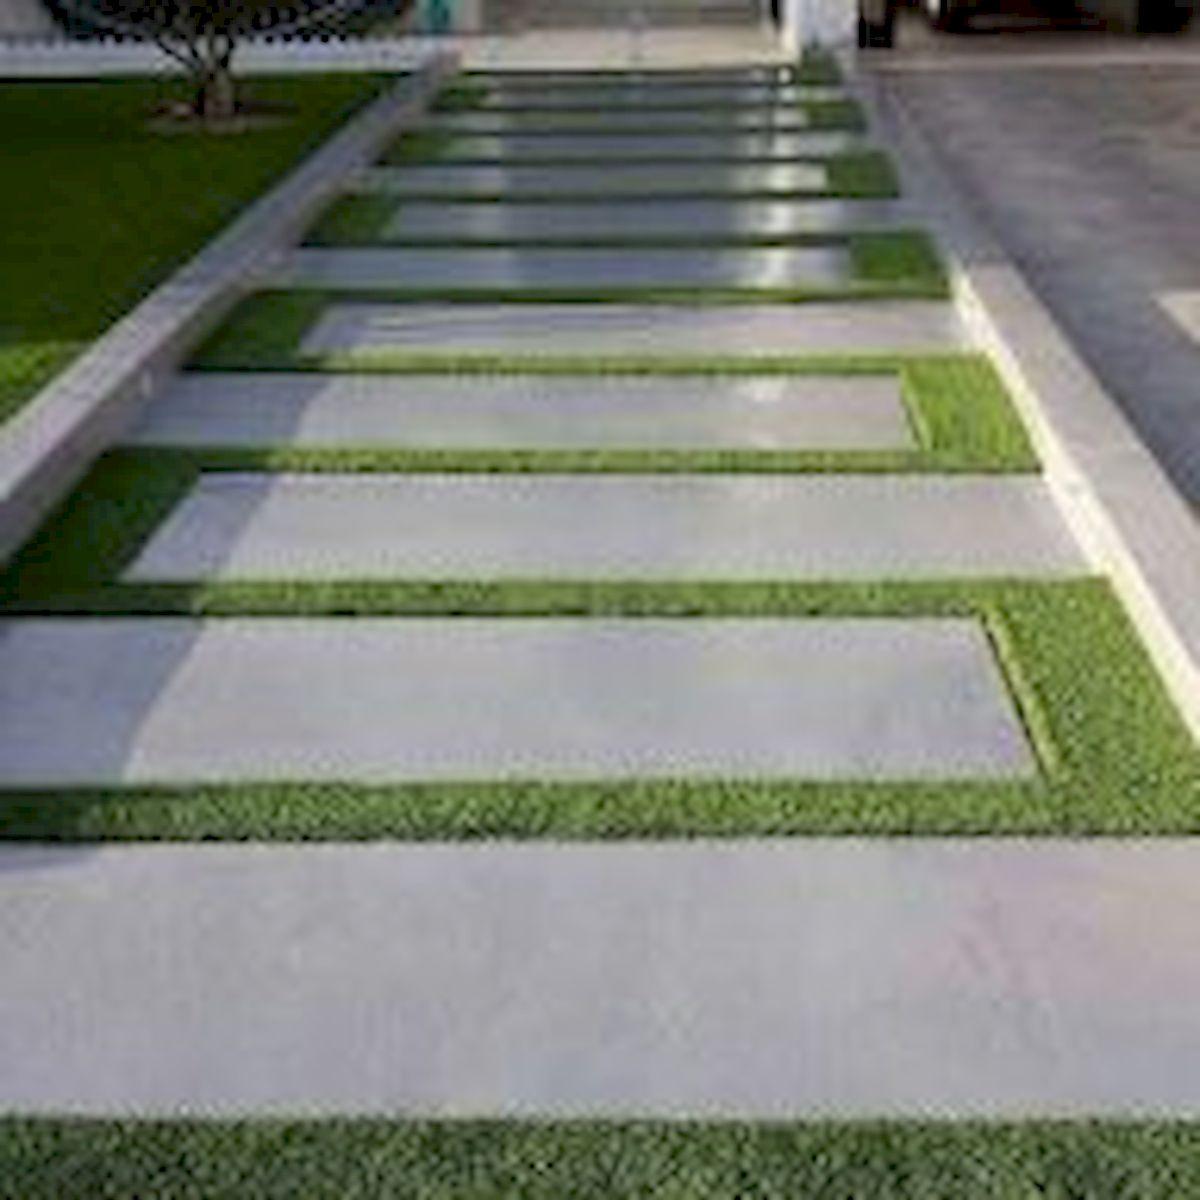 55 Fantastic Garden Path and Walkway Design Ideas (32)